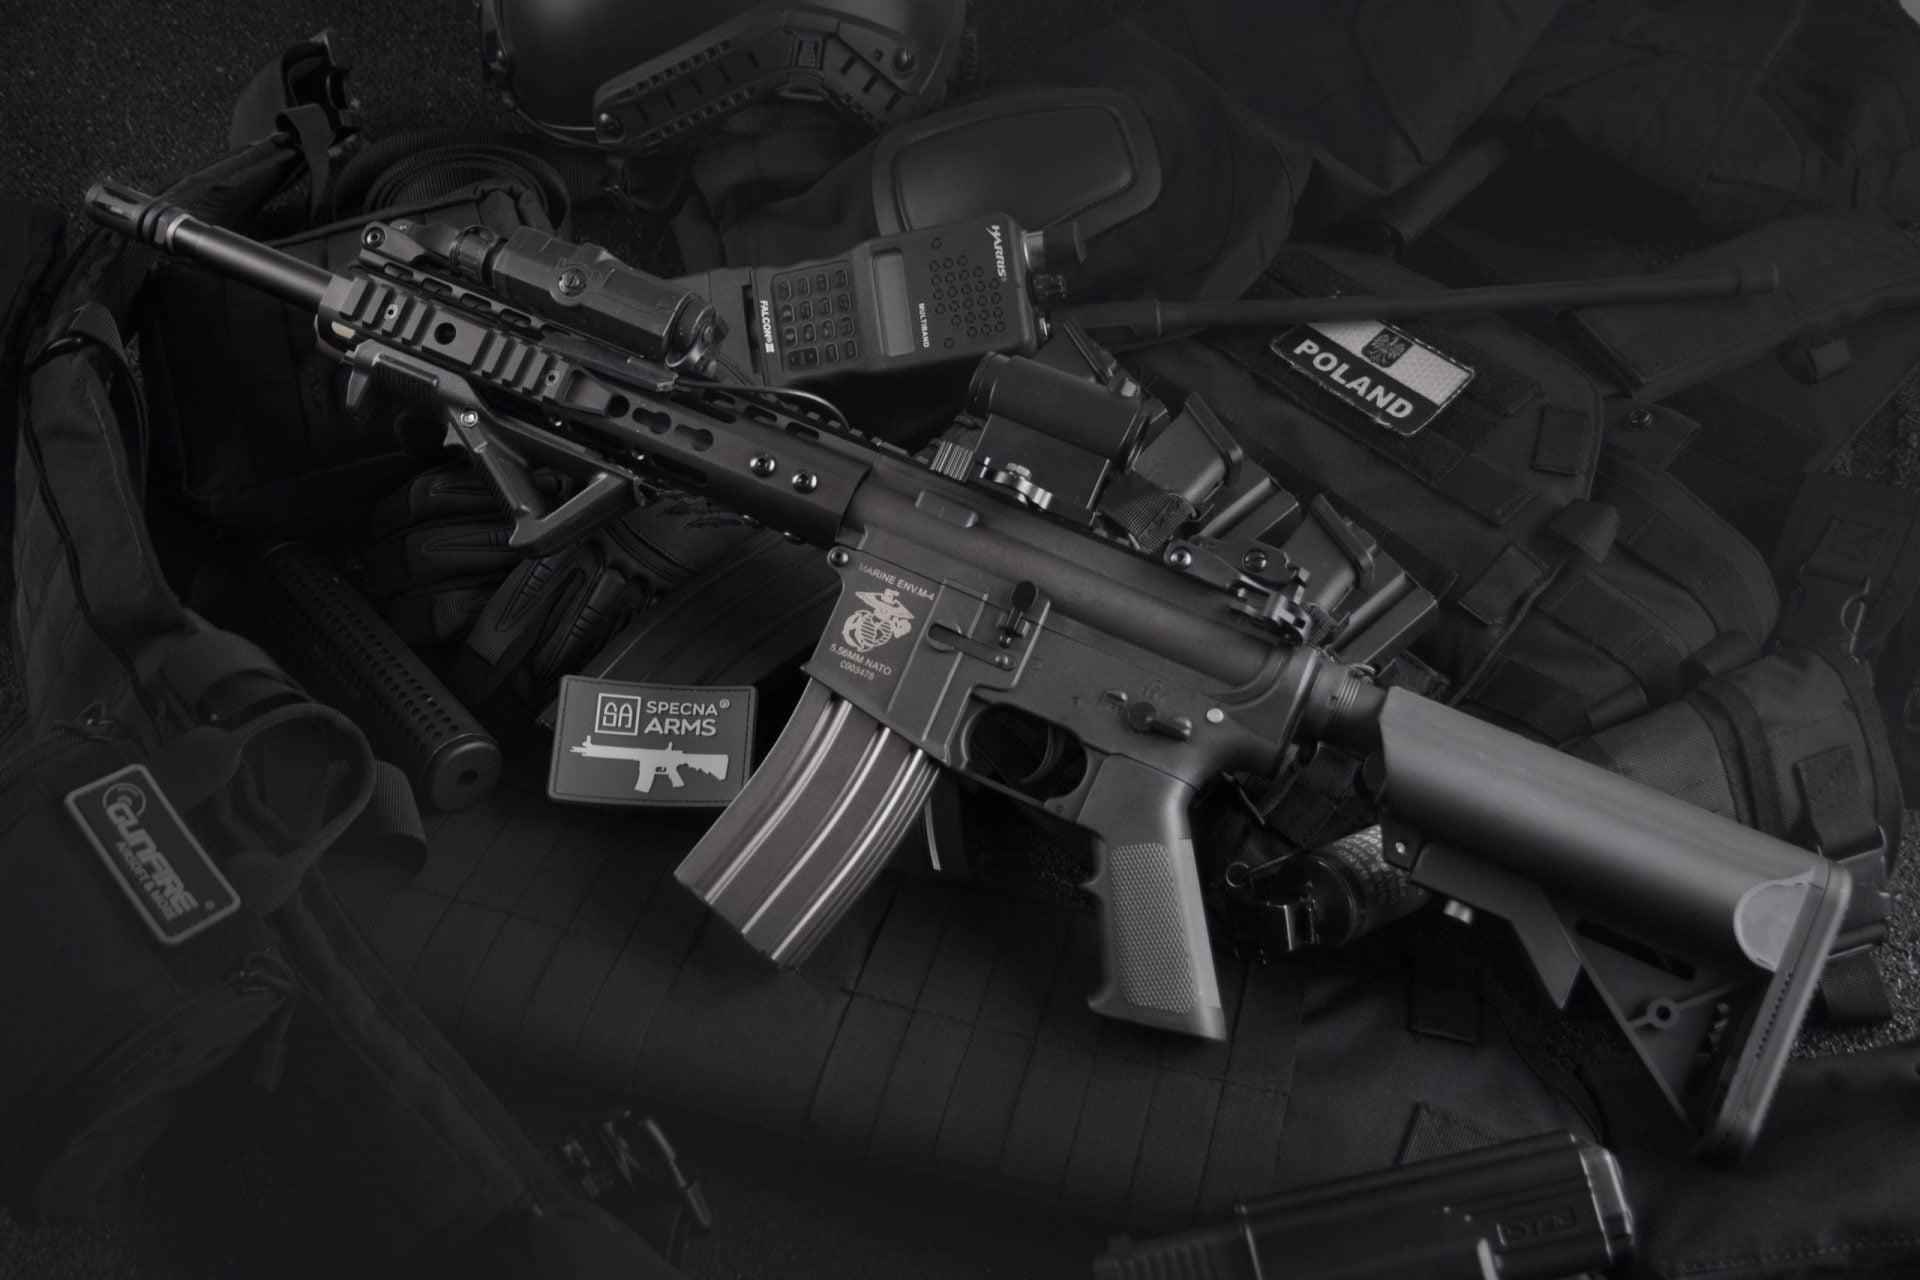 Illegal gun transport